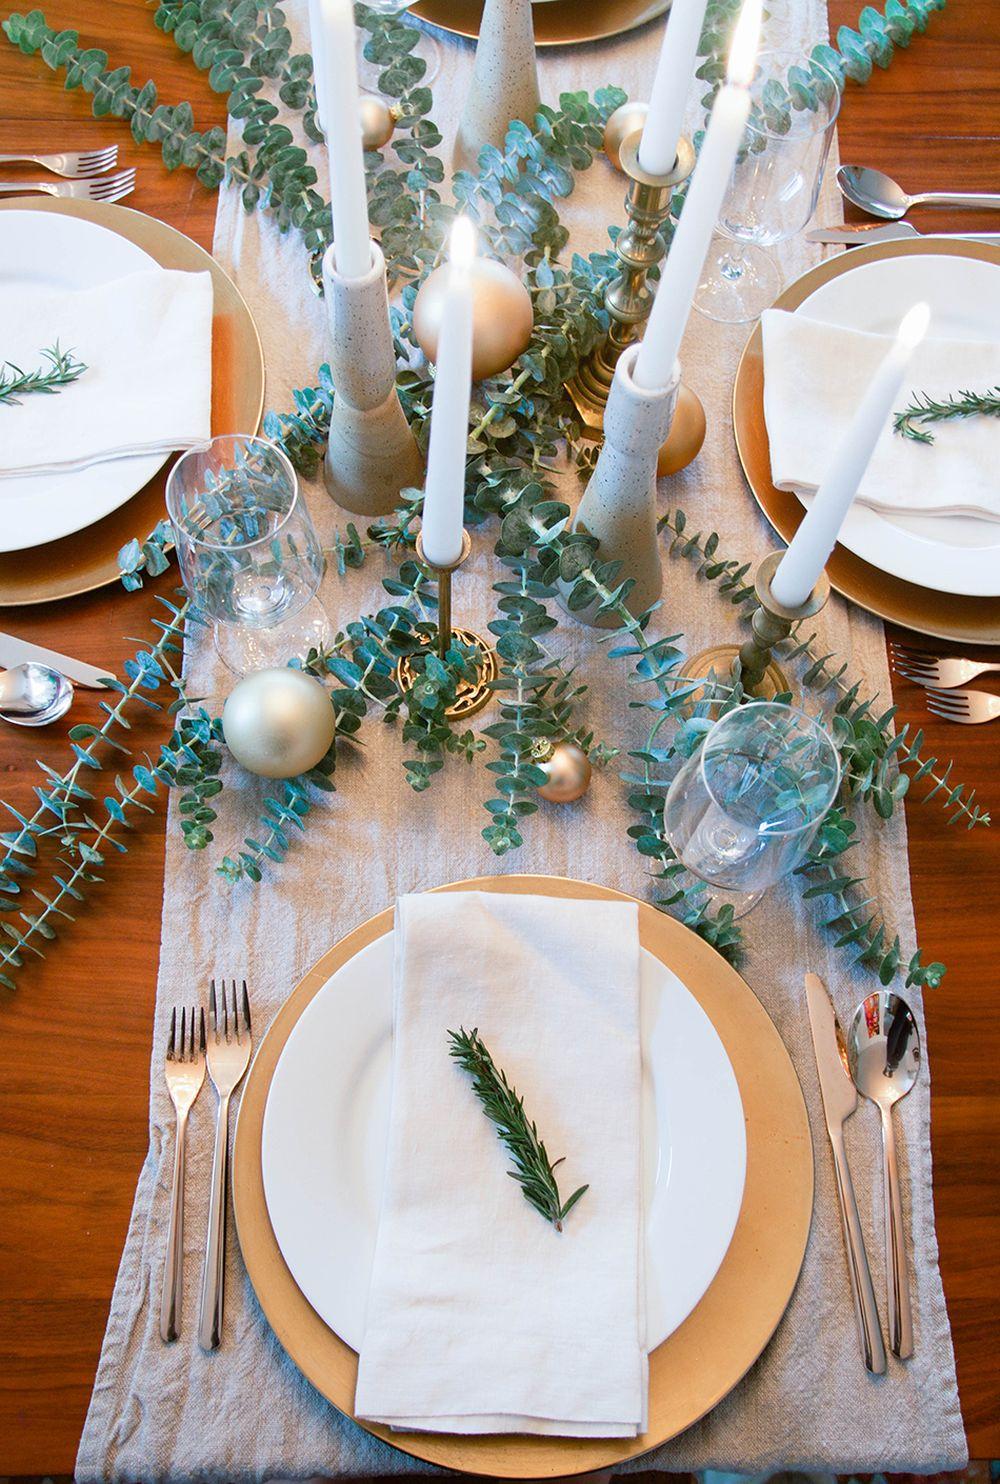 adelaparvu.com despre cum se aranjeaza masa pentru invitati in ocazii formale (7)